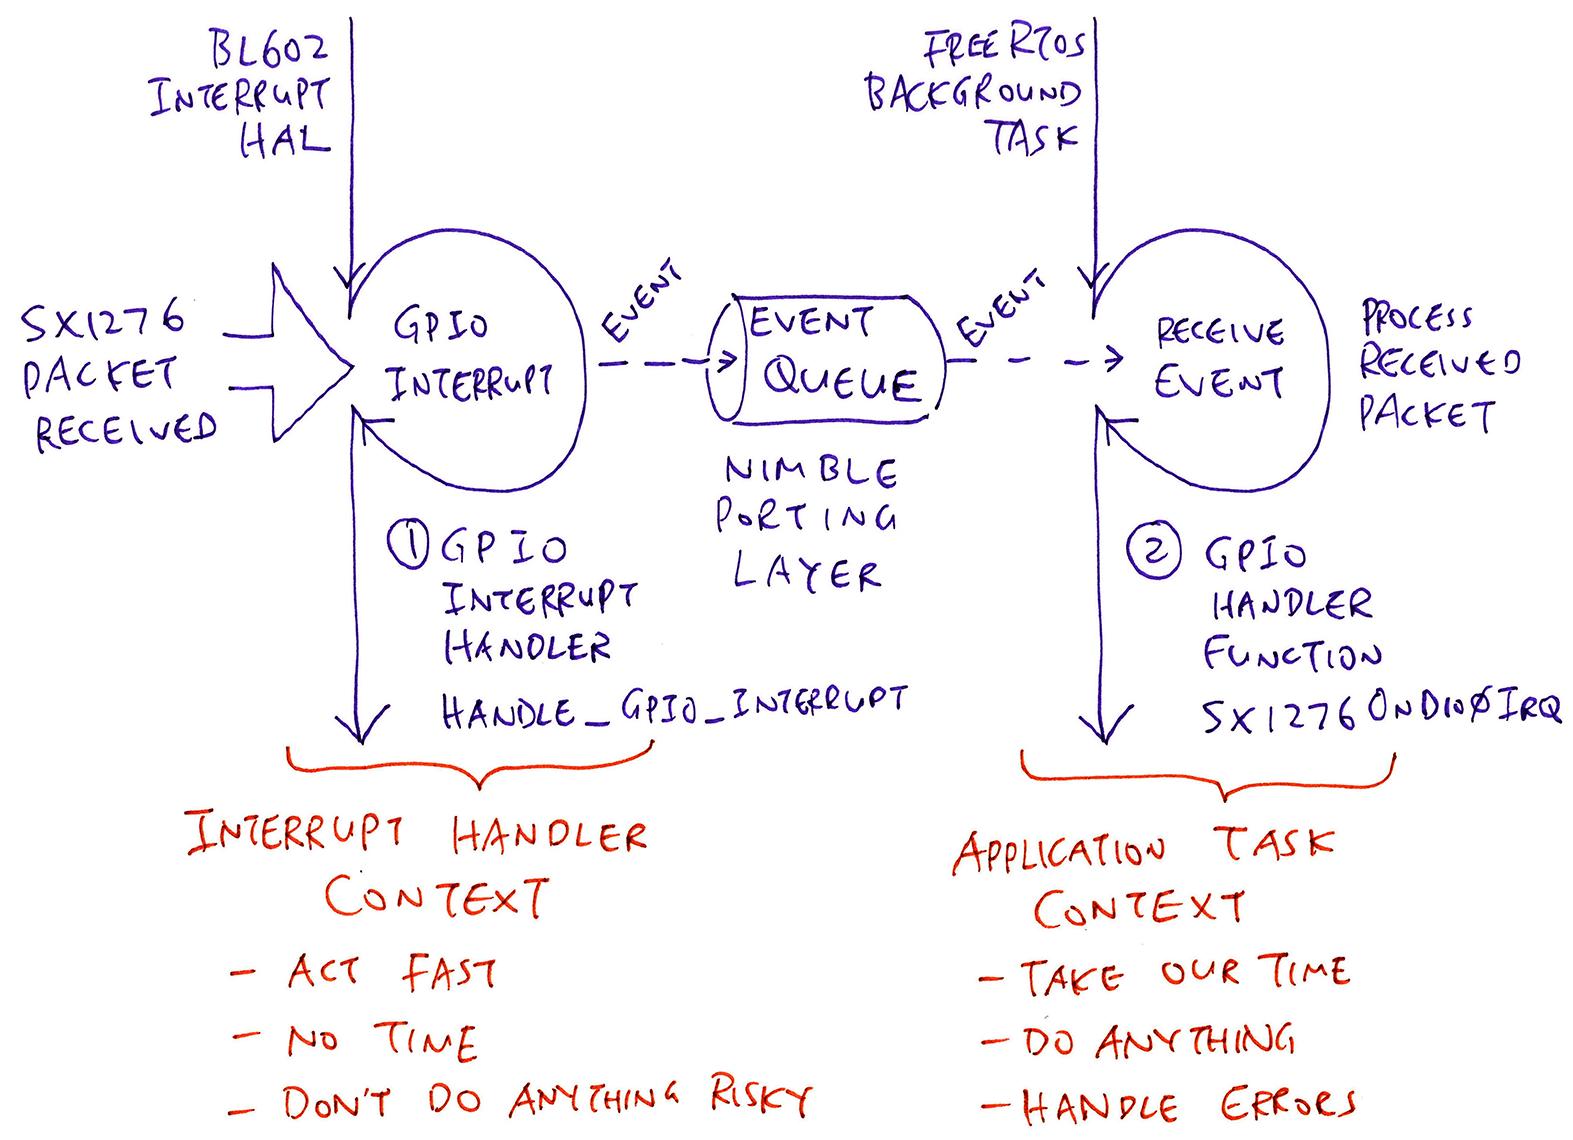 Interrupt Handler vs Application Task